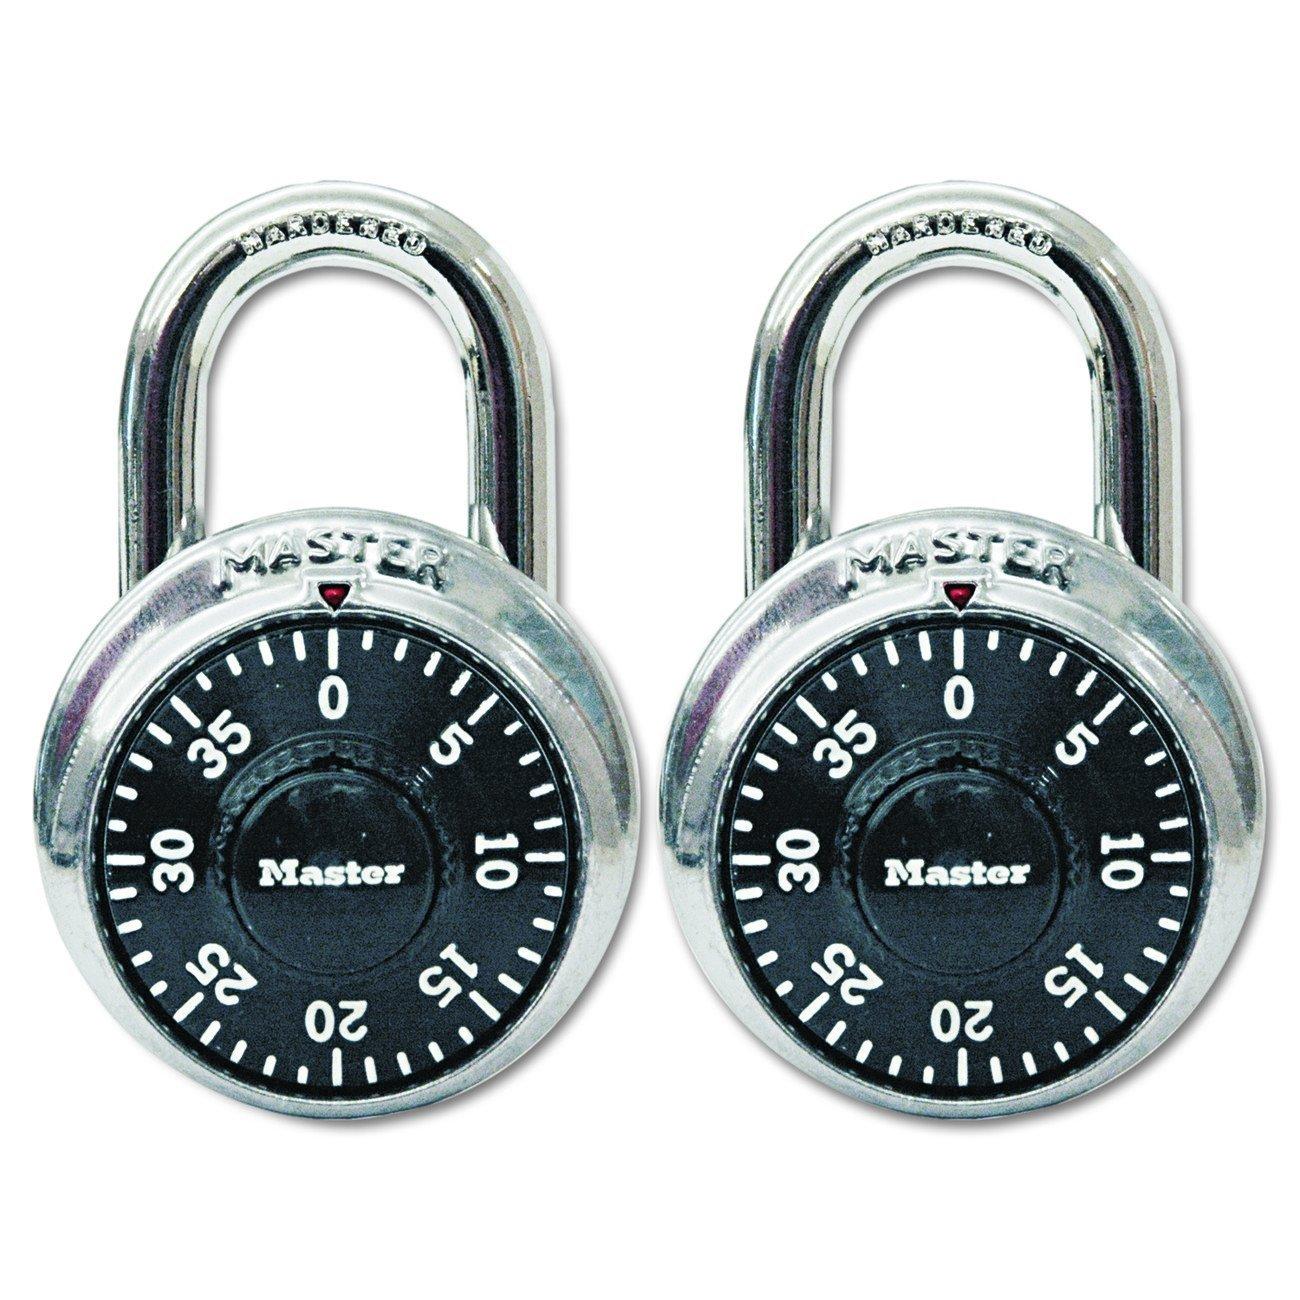 Master Lock 1500T Combination-Alike Padlocks, 16 Pack Contains 2 Locks, 32-Count